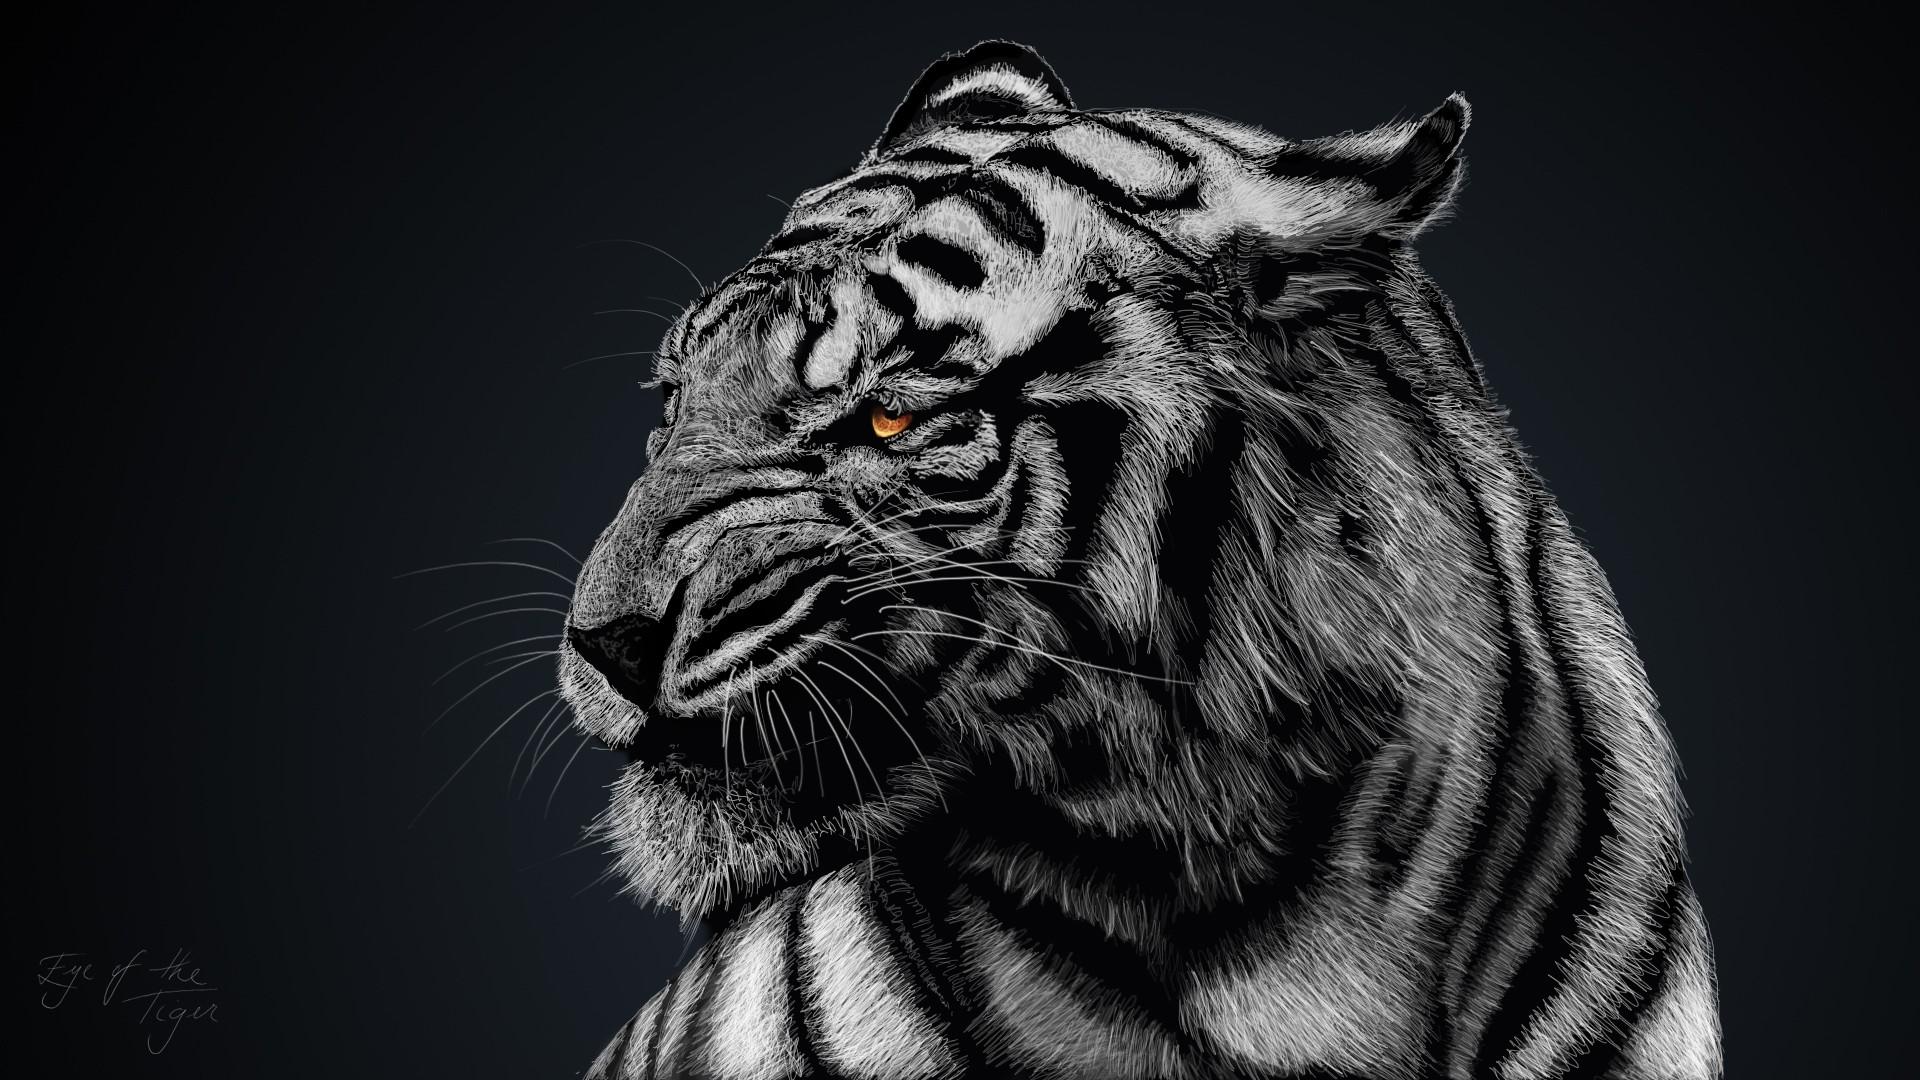 General 1920x1080 animals nature glowing eyes tiger mammals artwork big cats simple background DeviantArt